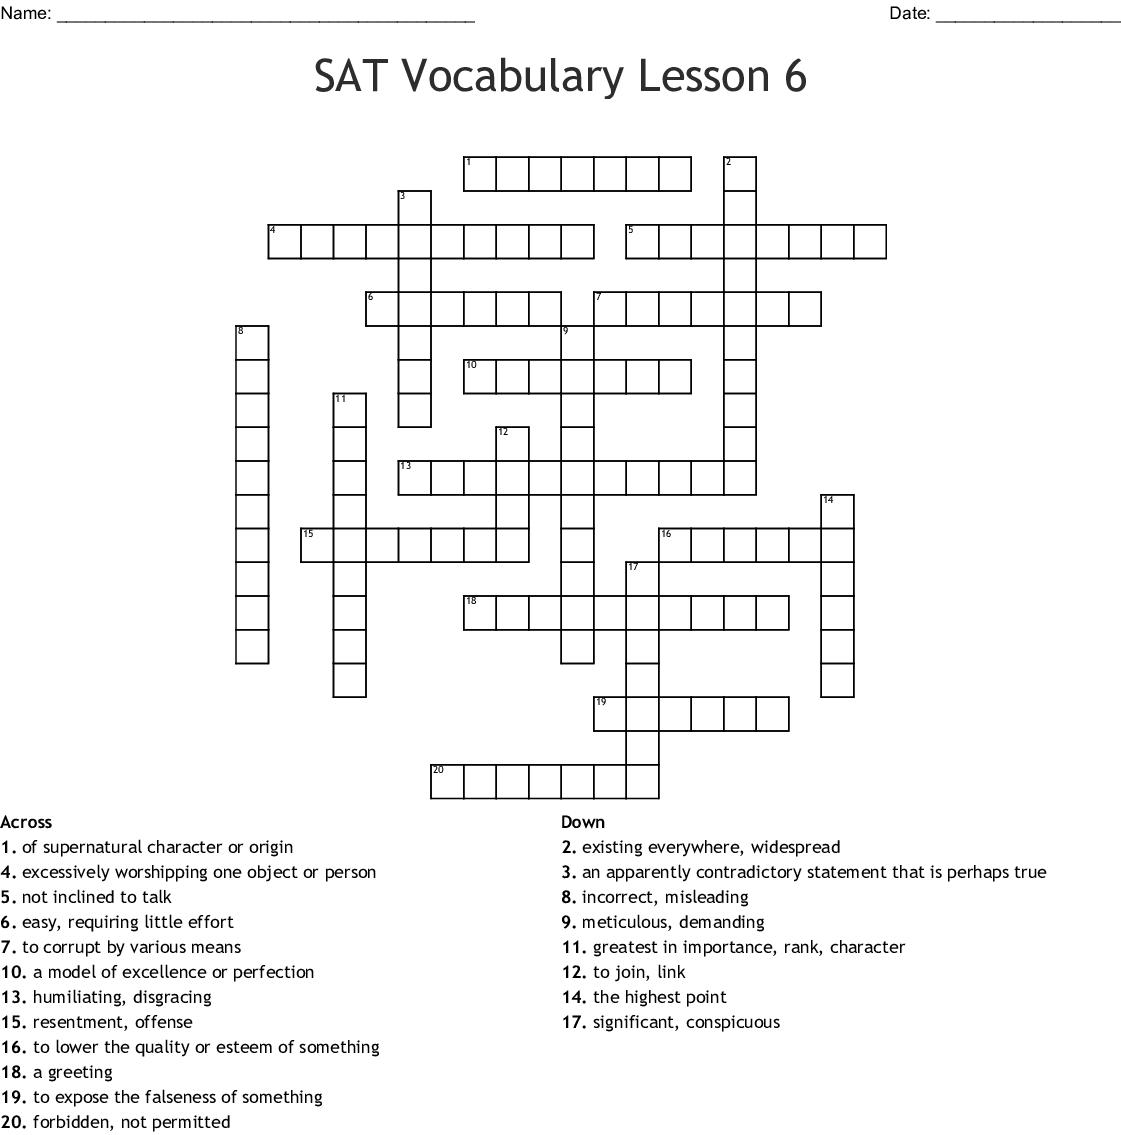 Sat Vocabulary Lesson 6 Crossword Wordmint